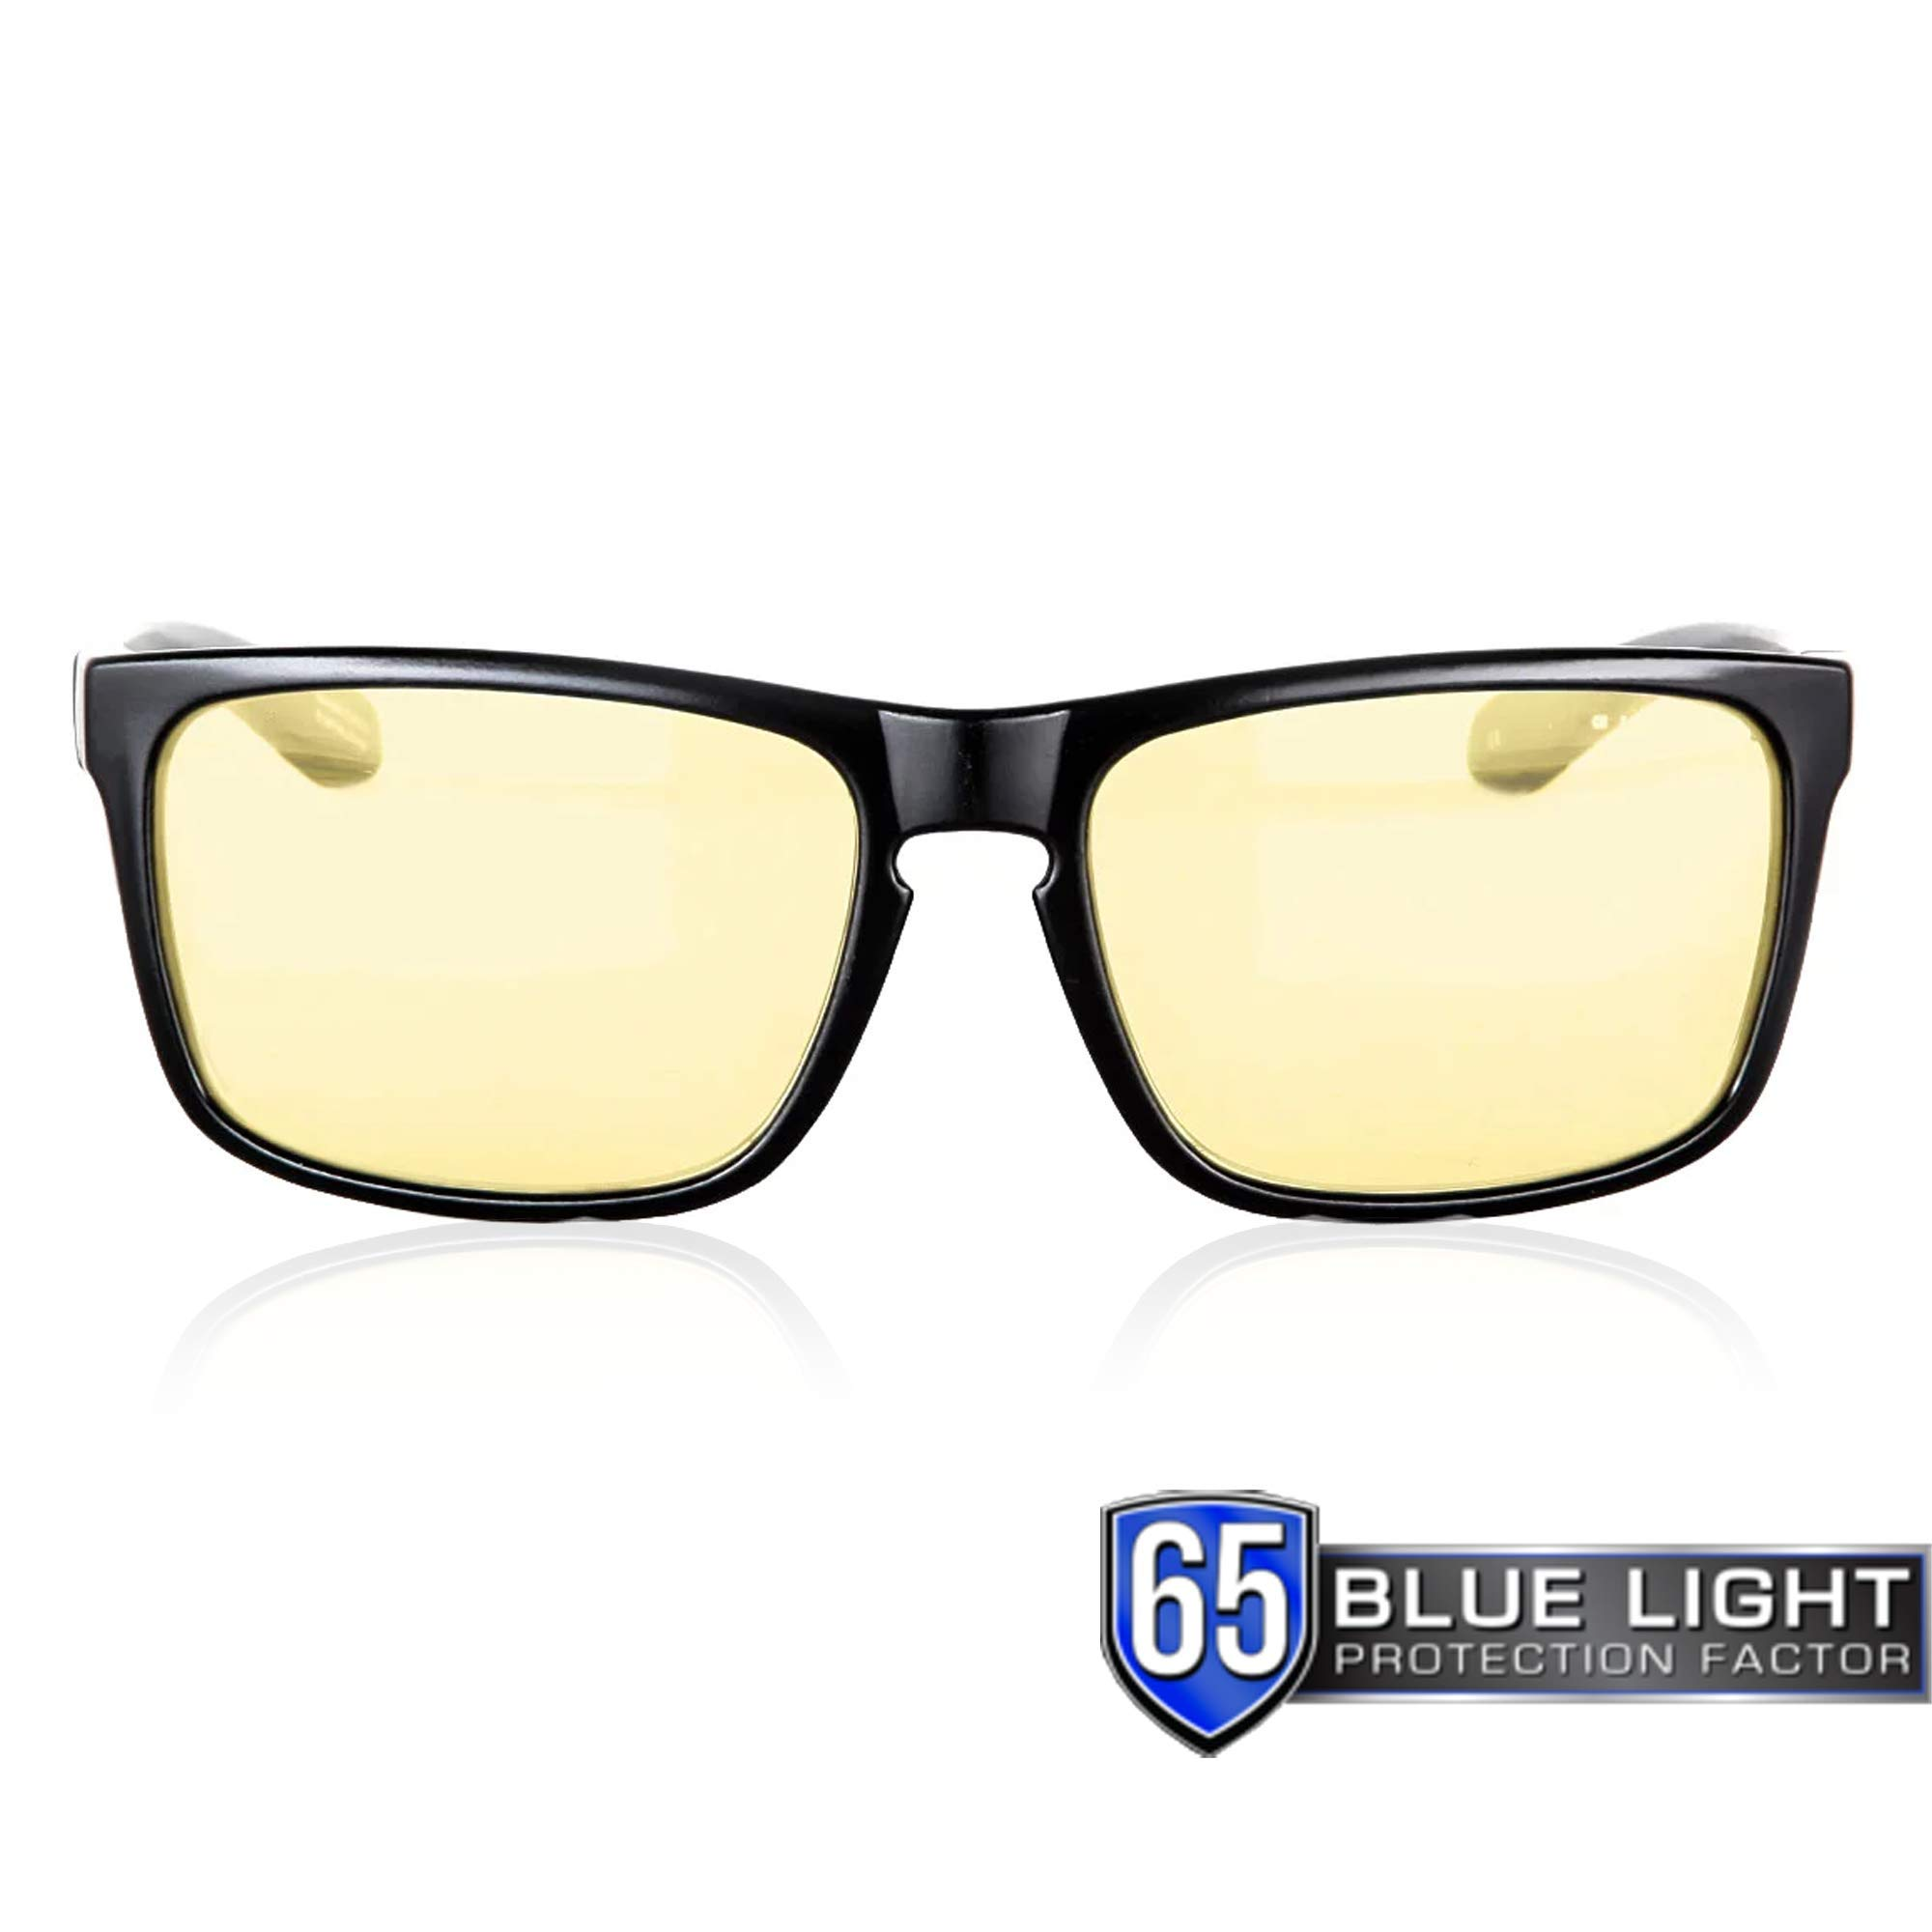 GUNNAR Gaming and Computer Eyewear /Intercept, Amber Tint - Patented Lens, Reduce Digital Eye Strain, Block 65% of Harmful Blue Light by Gunnar Optiks (Image #9)